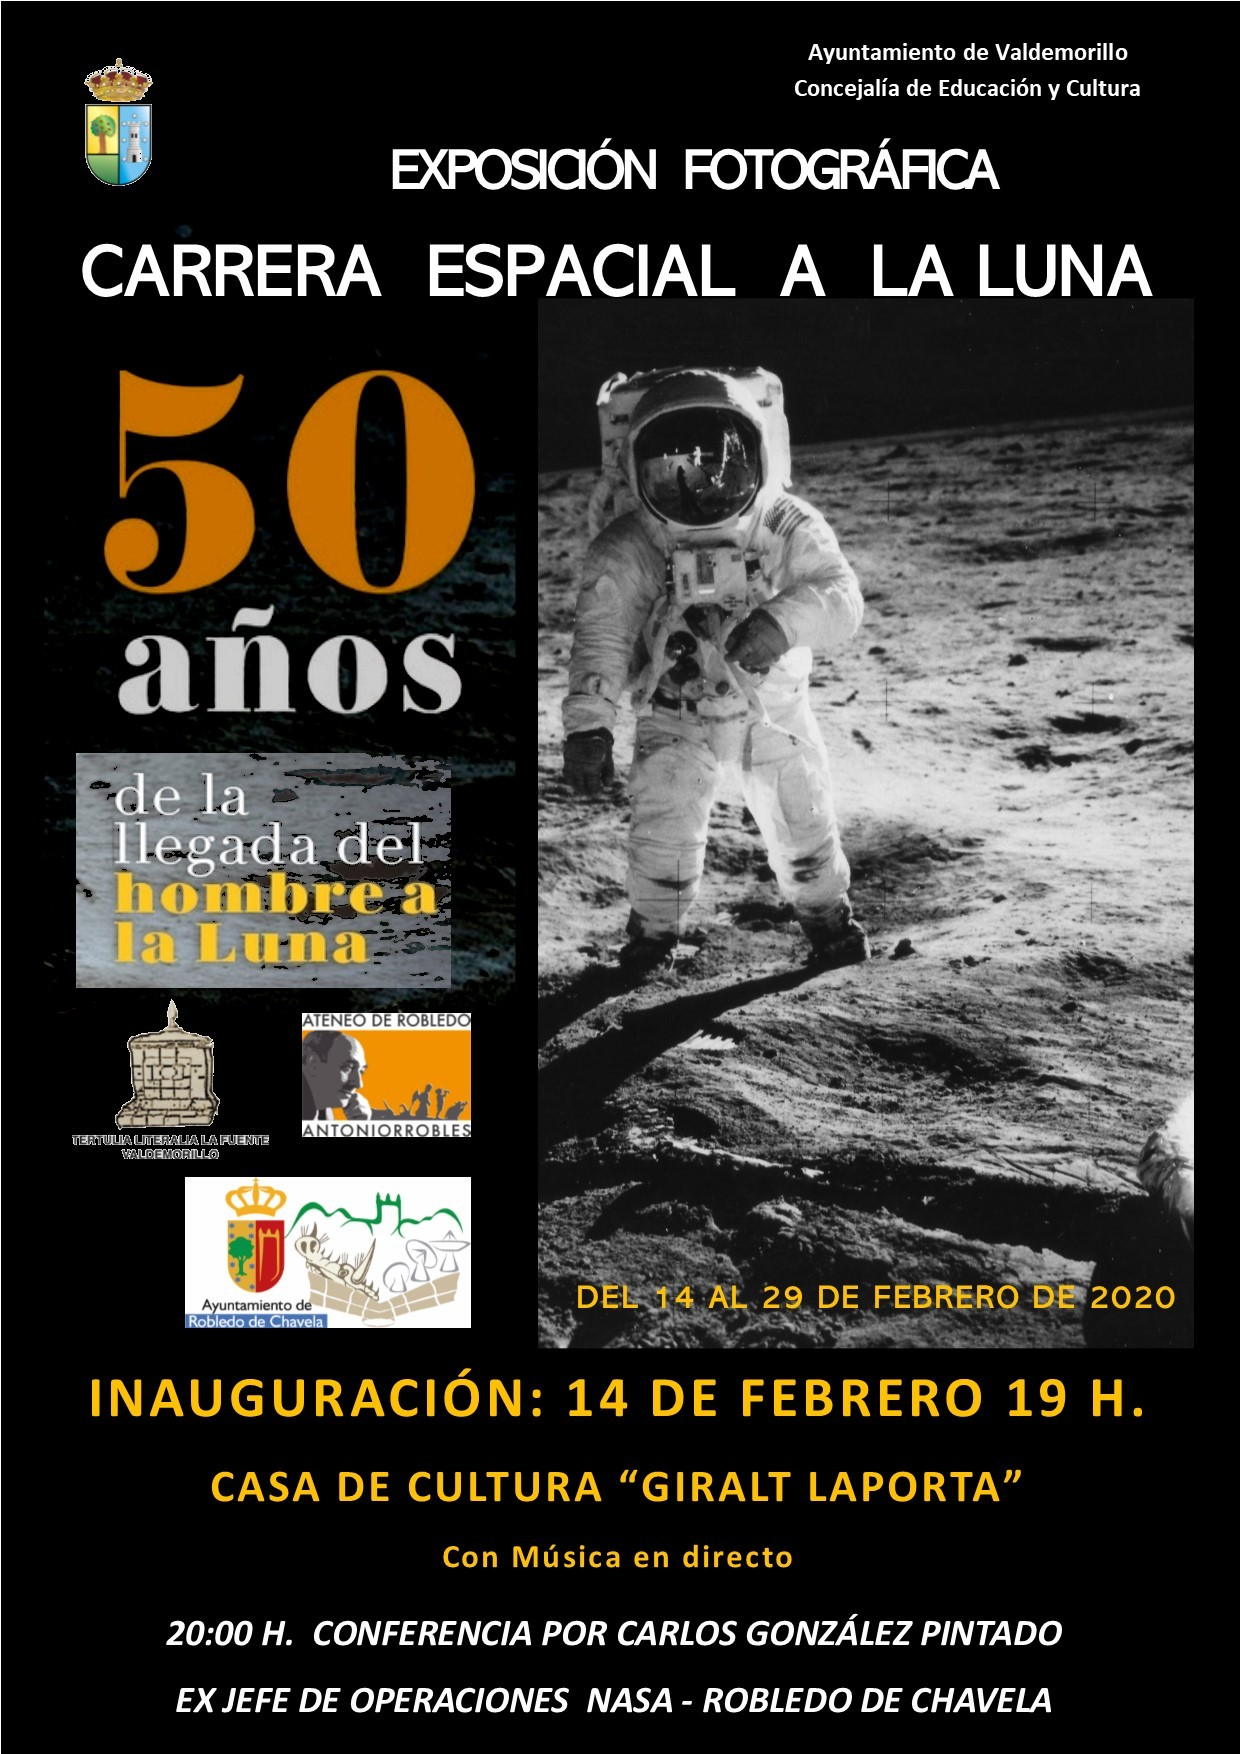 La carrera espacial a la luna toma tierra ya  en la Sala de Exposiciones de la Giralt Laporta